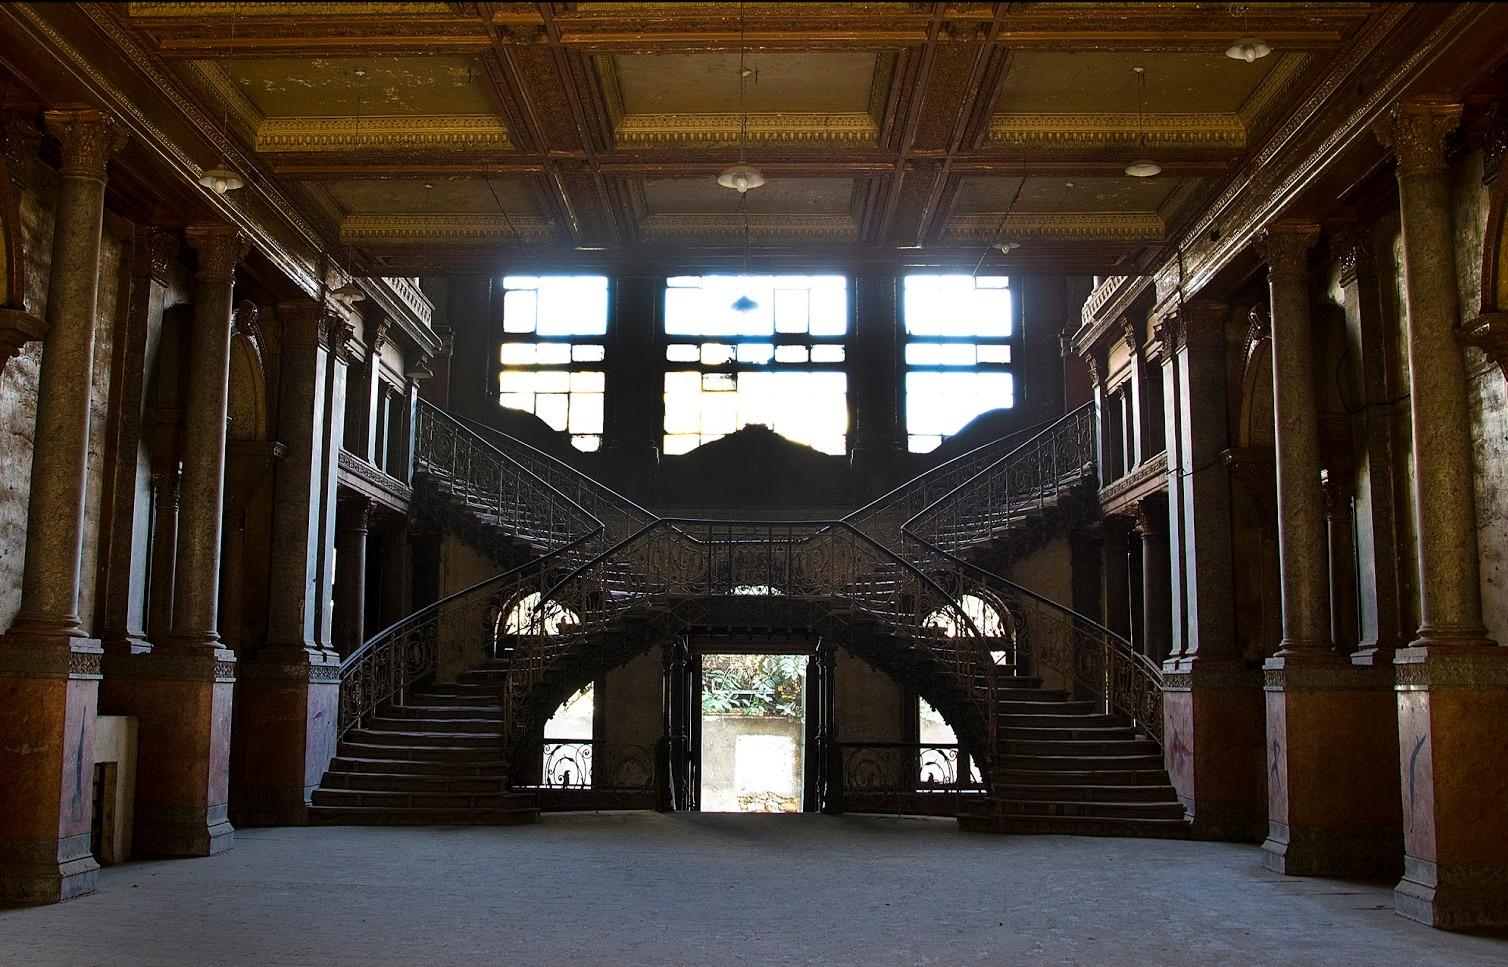 tour-palazzi-storici-famosi-cairo-egitto (5)